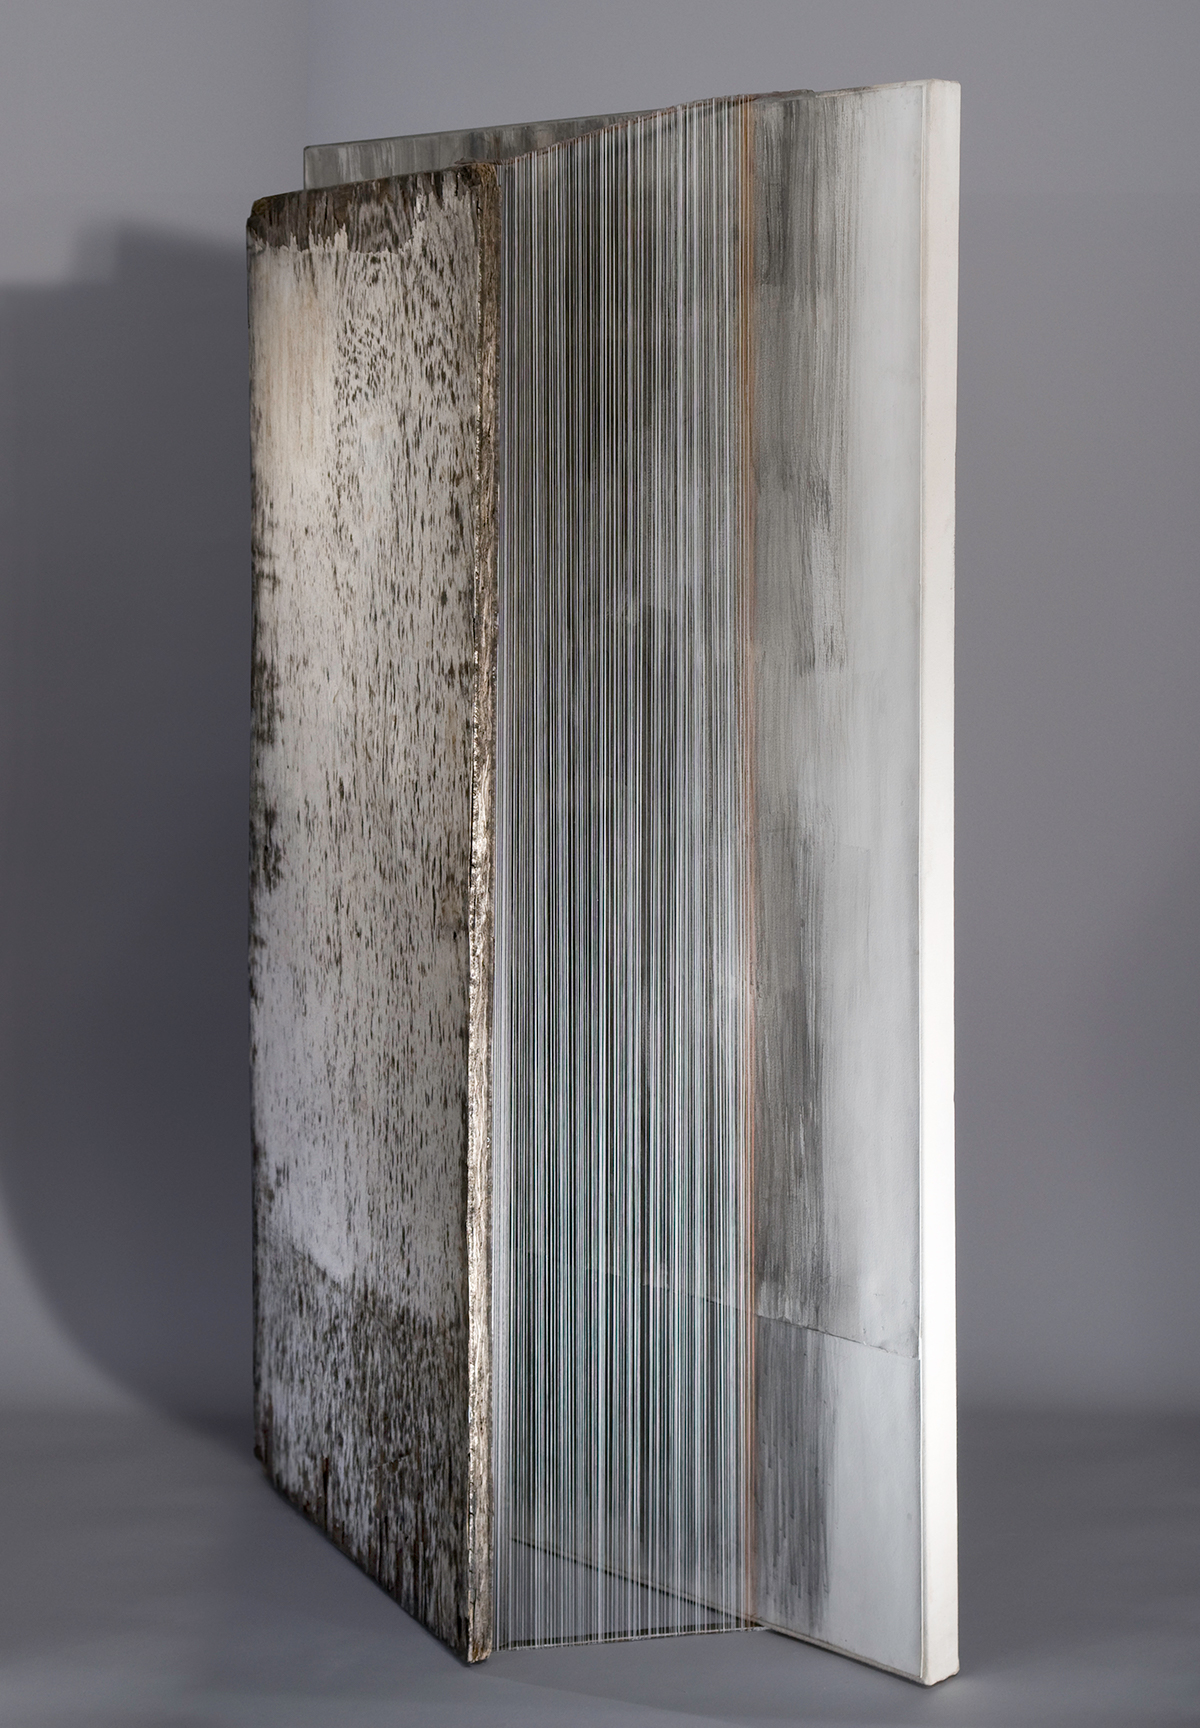 WHITE ALBUM   Found wood, pencil, paper, thread  50 x 31 x 9.5 Inches